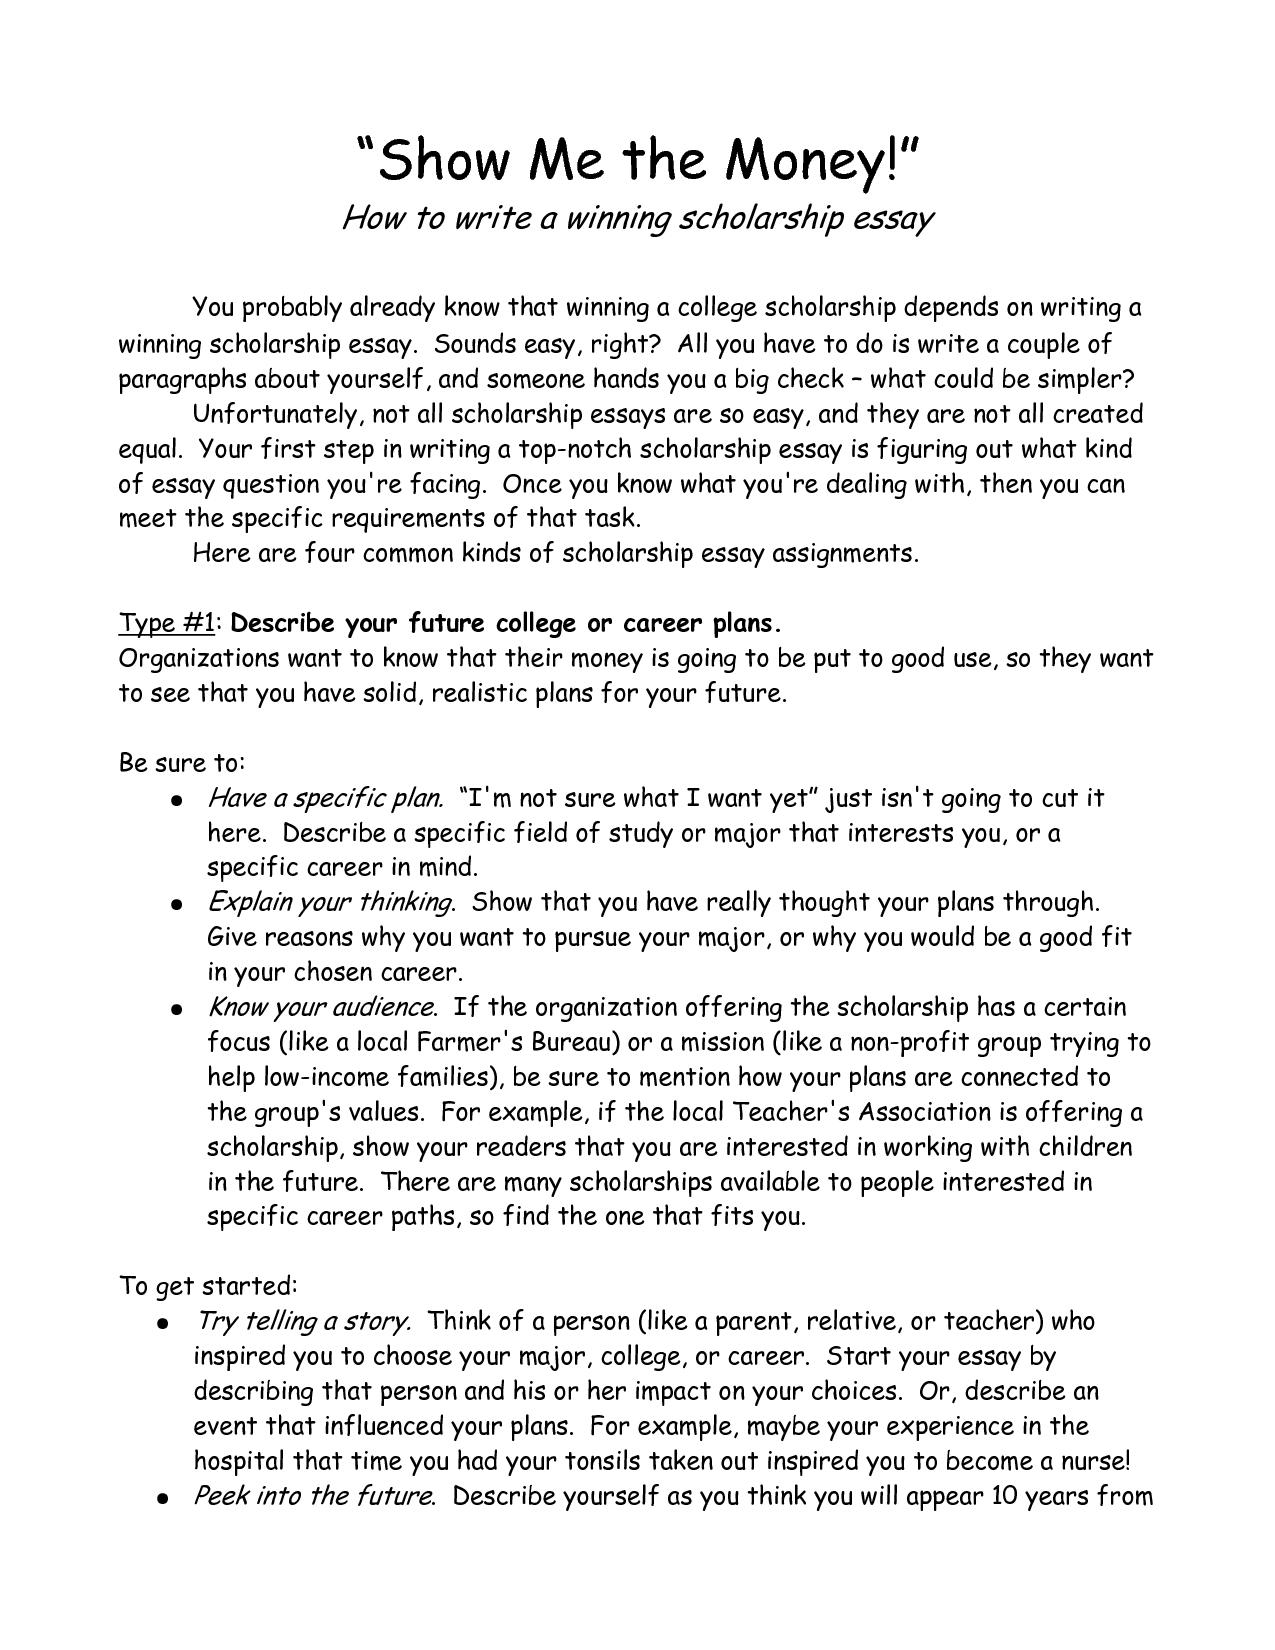 003 Scholarship Essay Tips Example Singular Rotc Psc Reddit Full